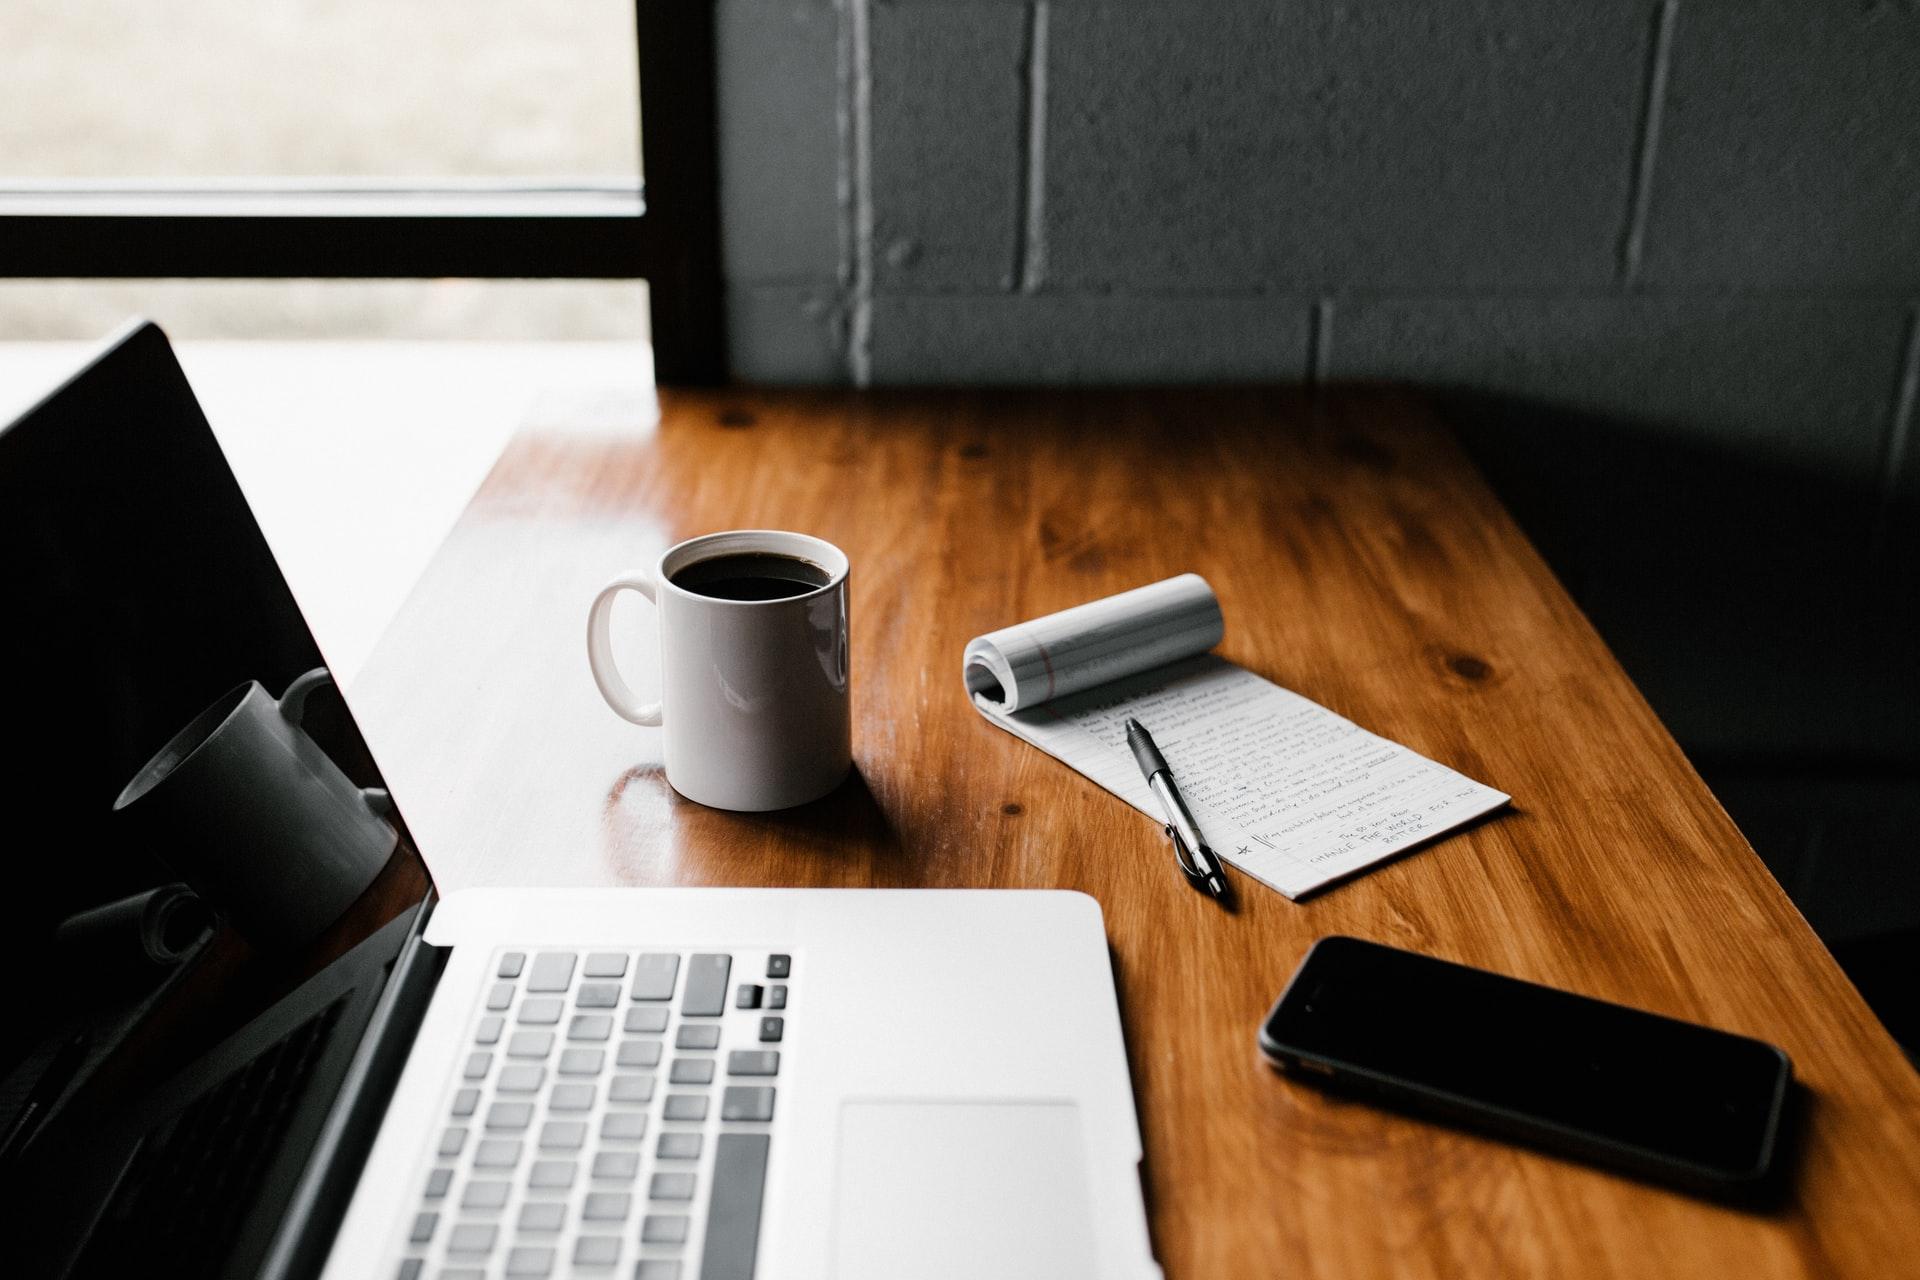 WordPressにプラグインなしで目次機能を追加する方法